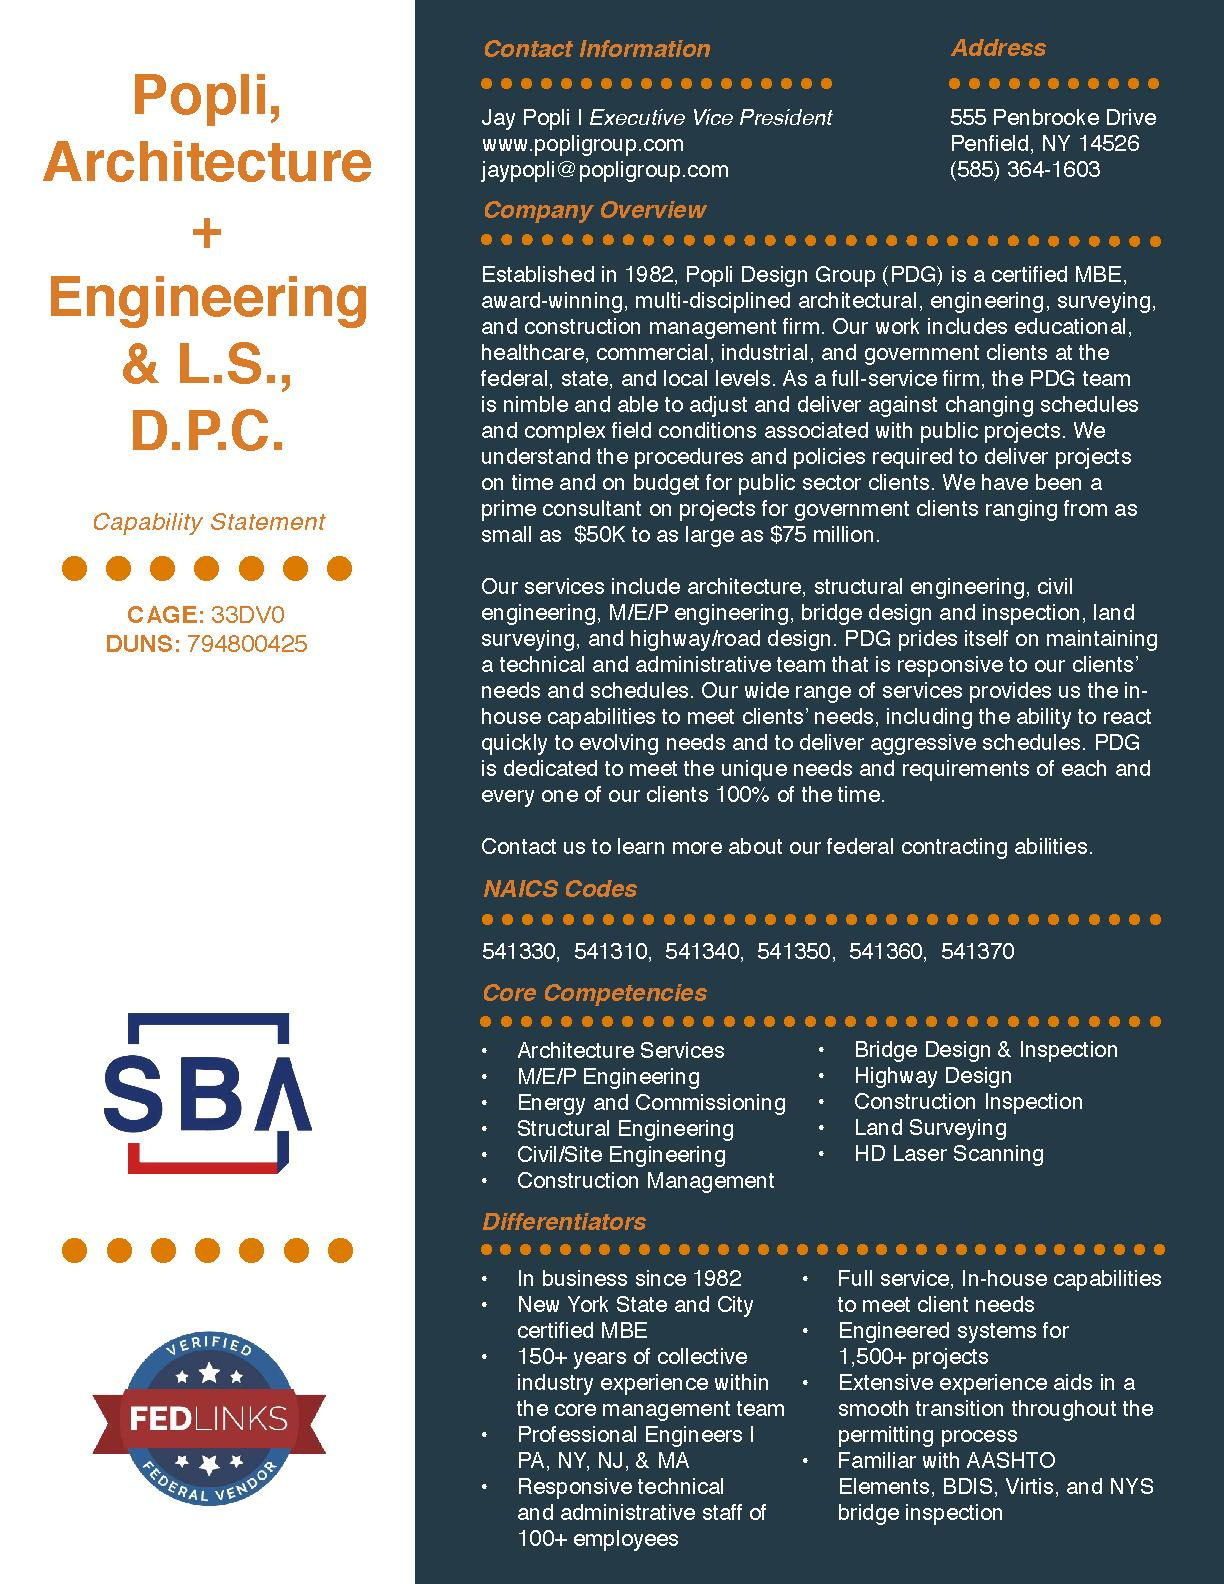 Popli architecture   engineering   l.s.  d.p.c. capability statement